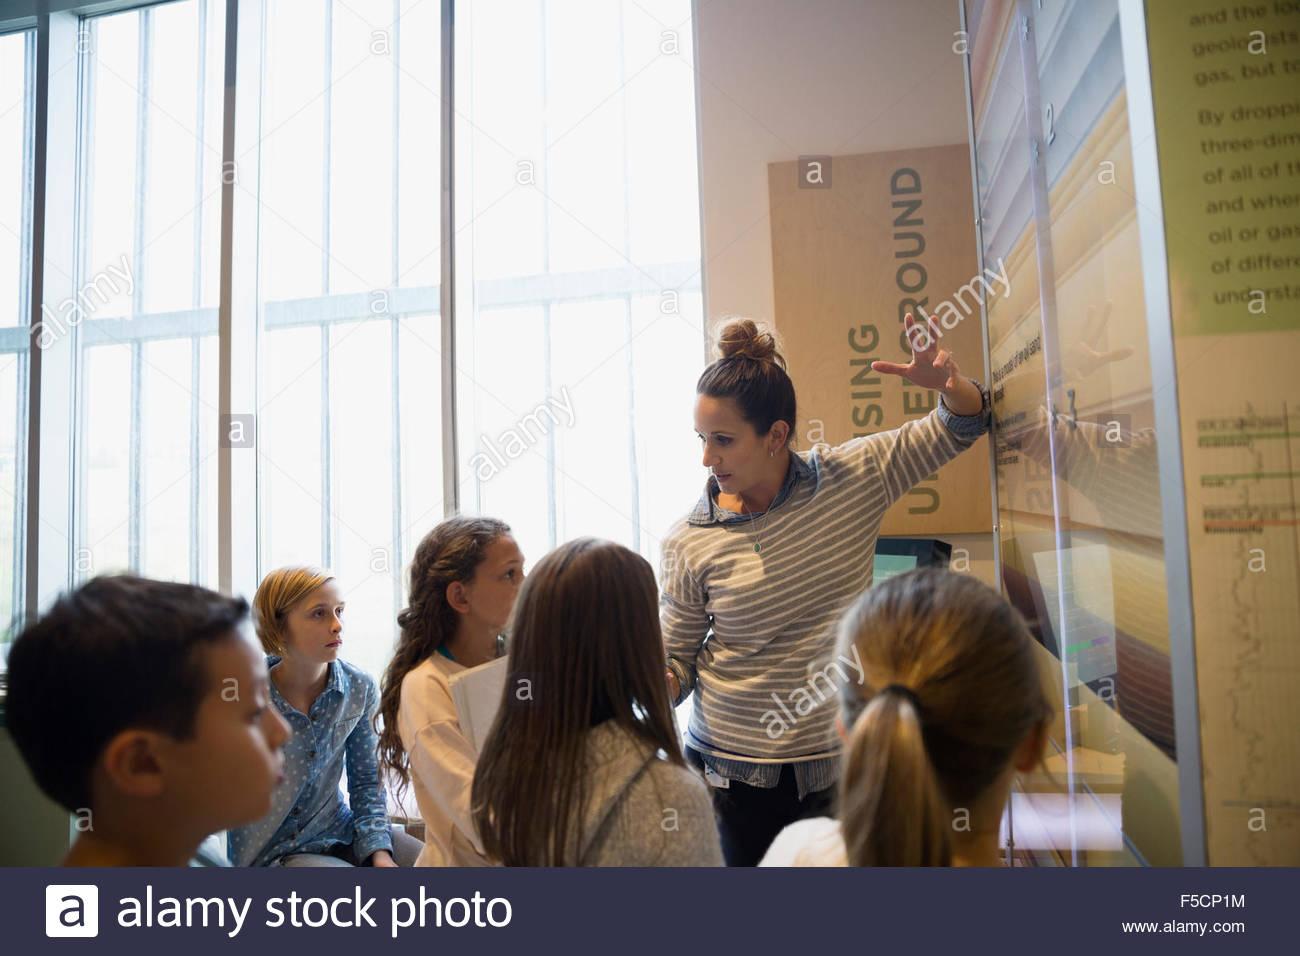 Lehrer, Ausstellung, Studenten im Science Center zu erklären Stockbild